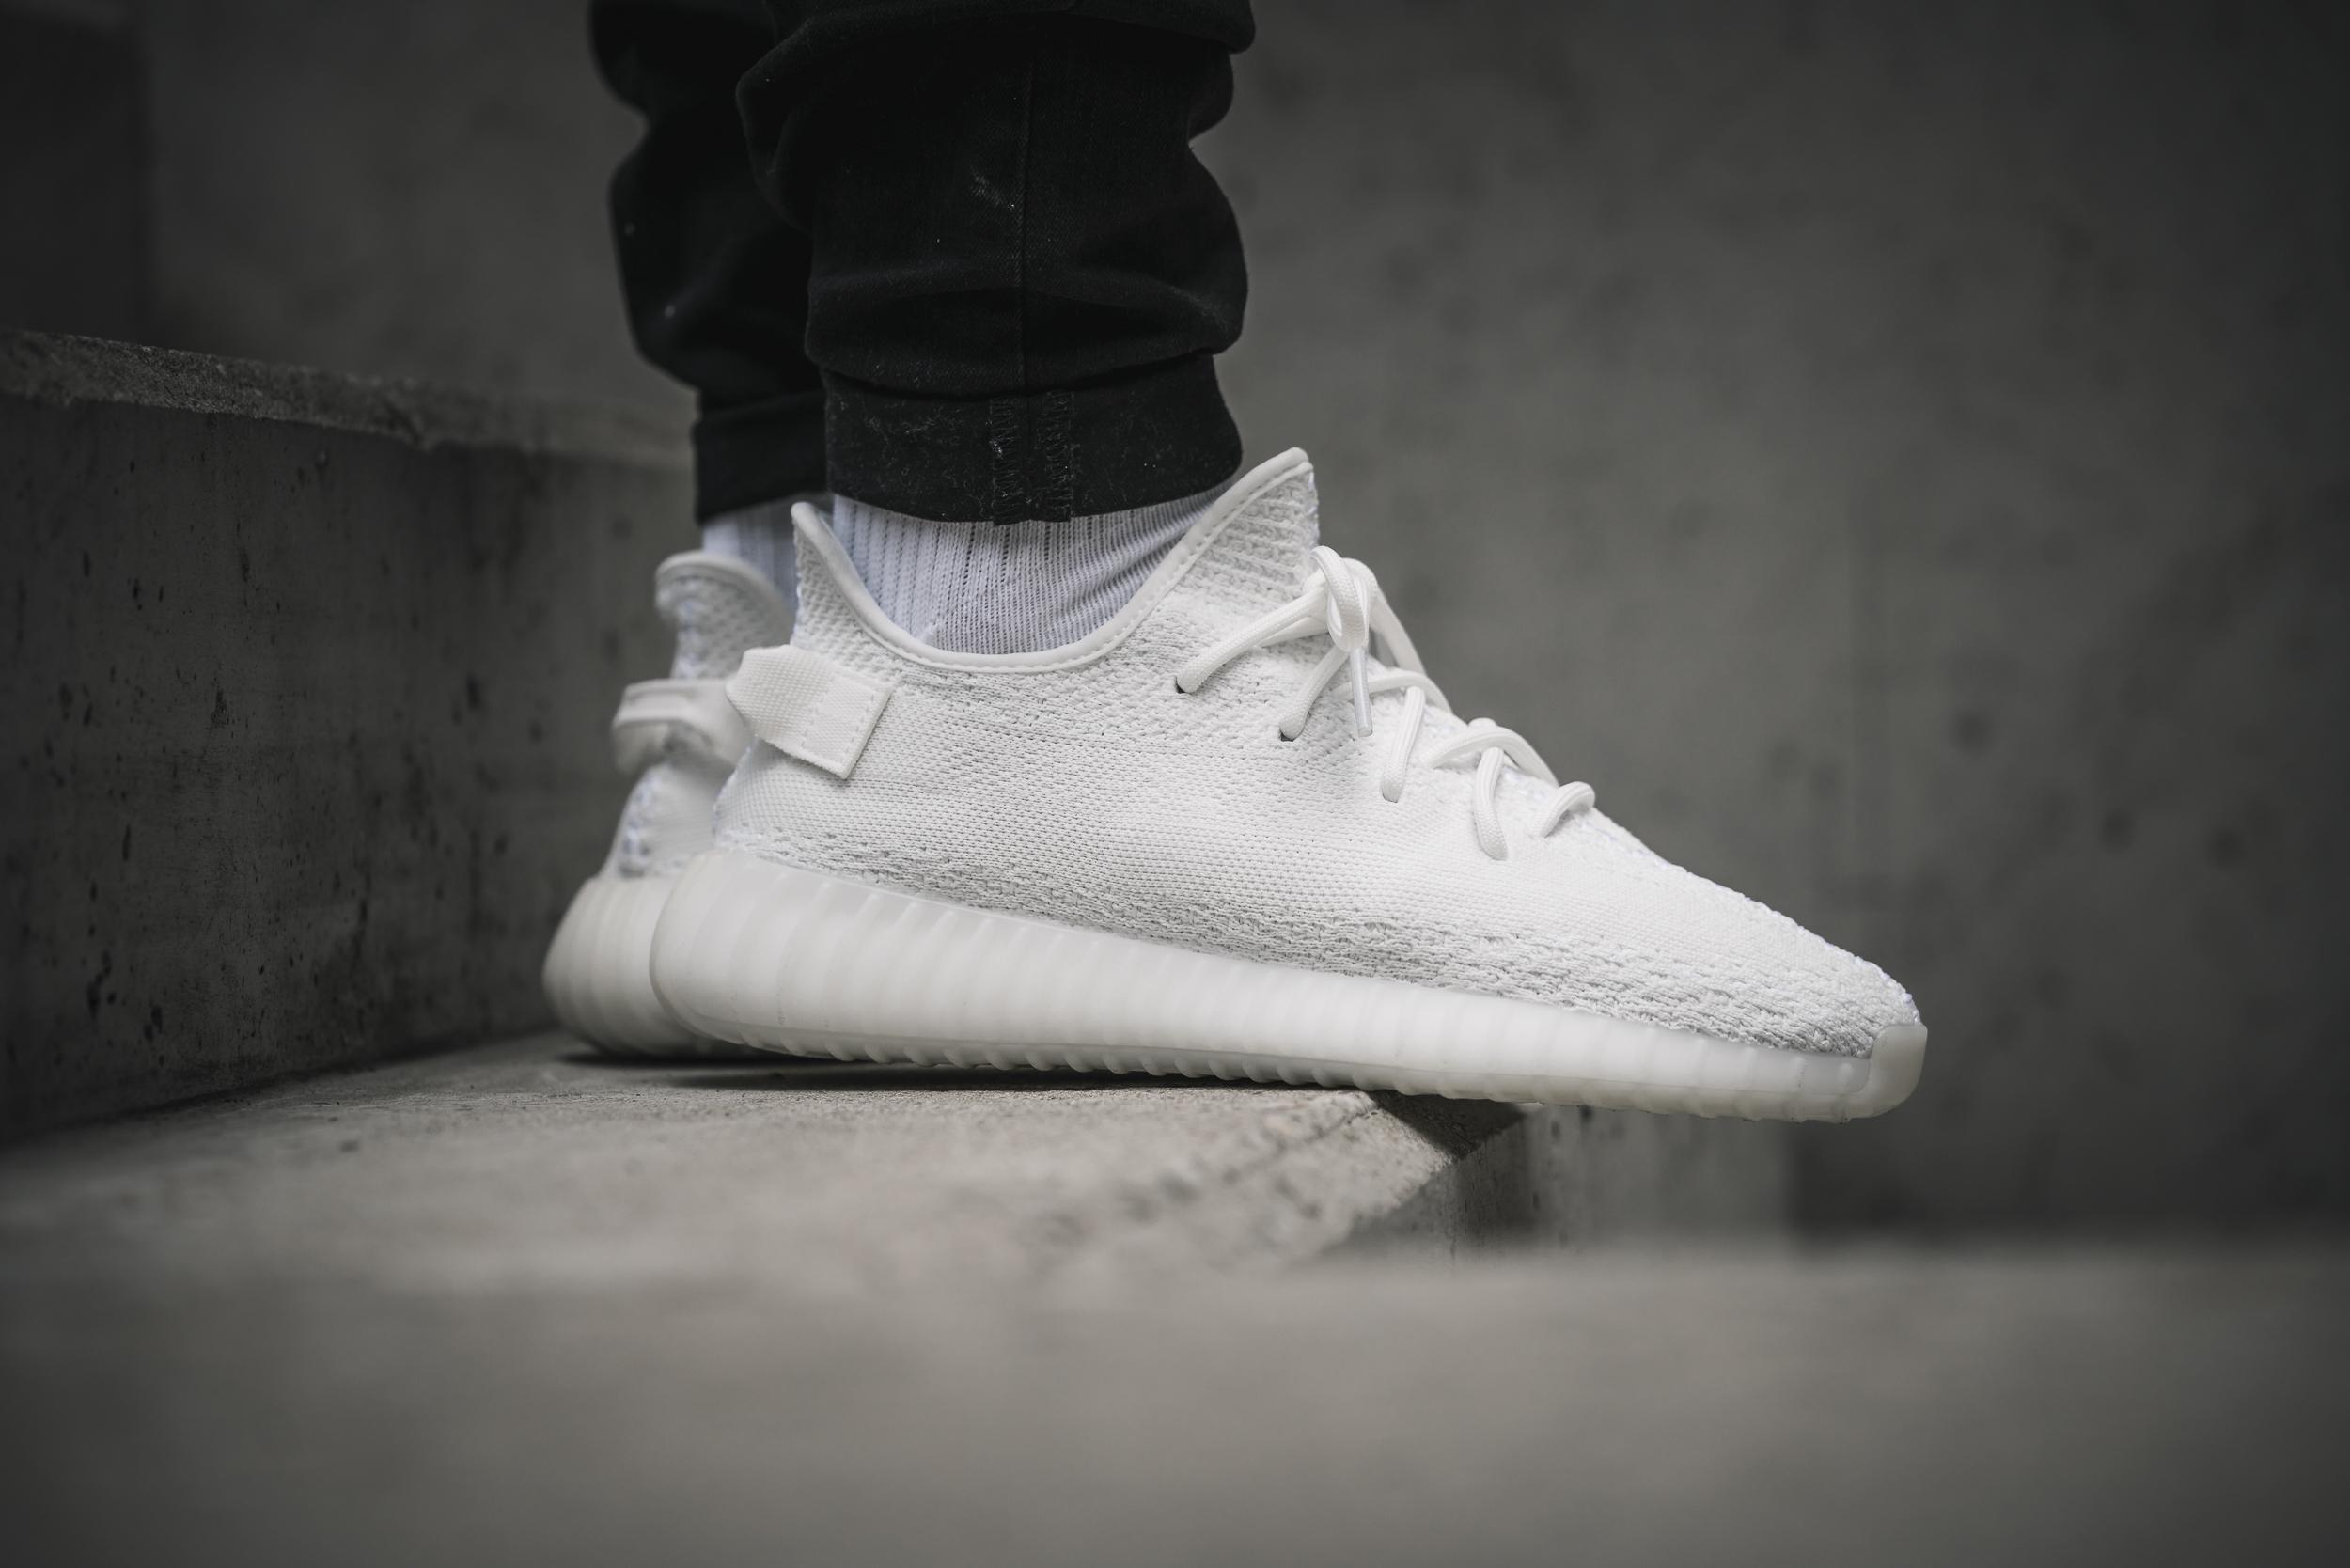 50382d8816bd4 ... adidas Yeezy Boost 350 V2 - Solebox Preview On Foot - EU Kicks Sneaker  Magazine ...